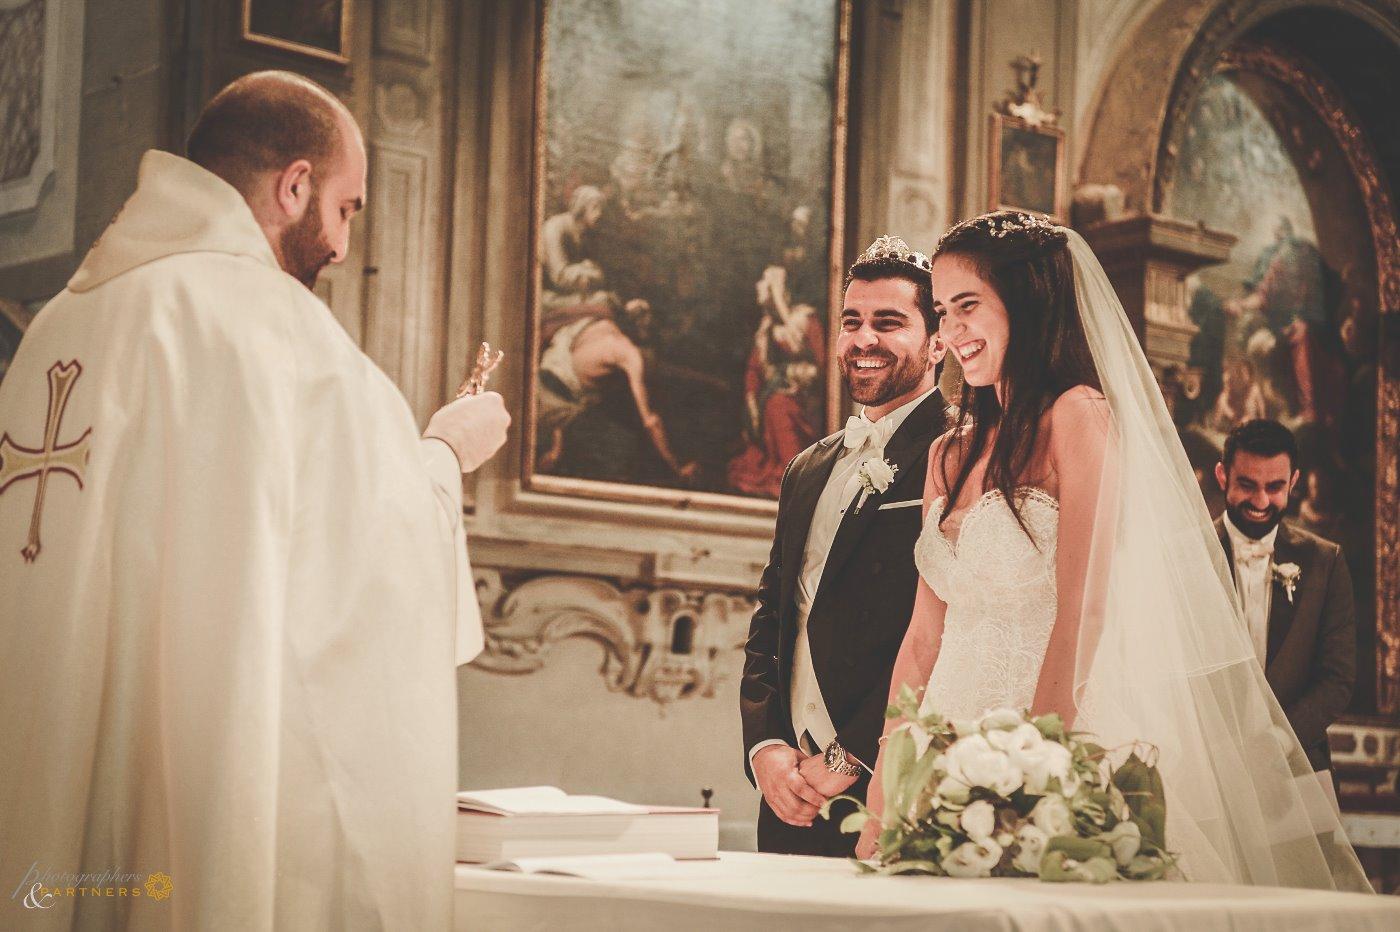 photography_weddings_florence_09.jpg